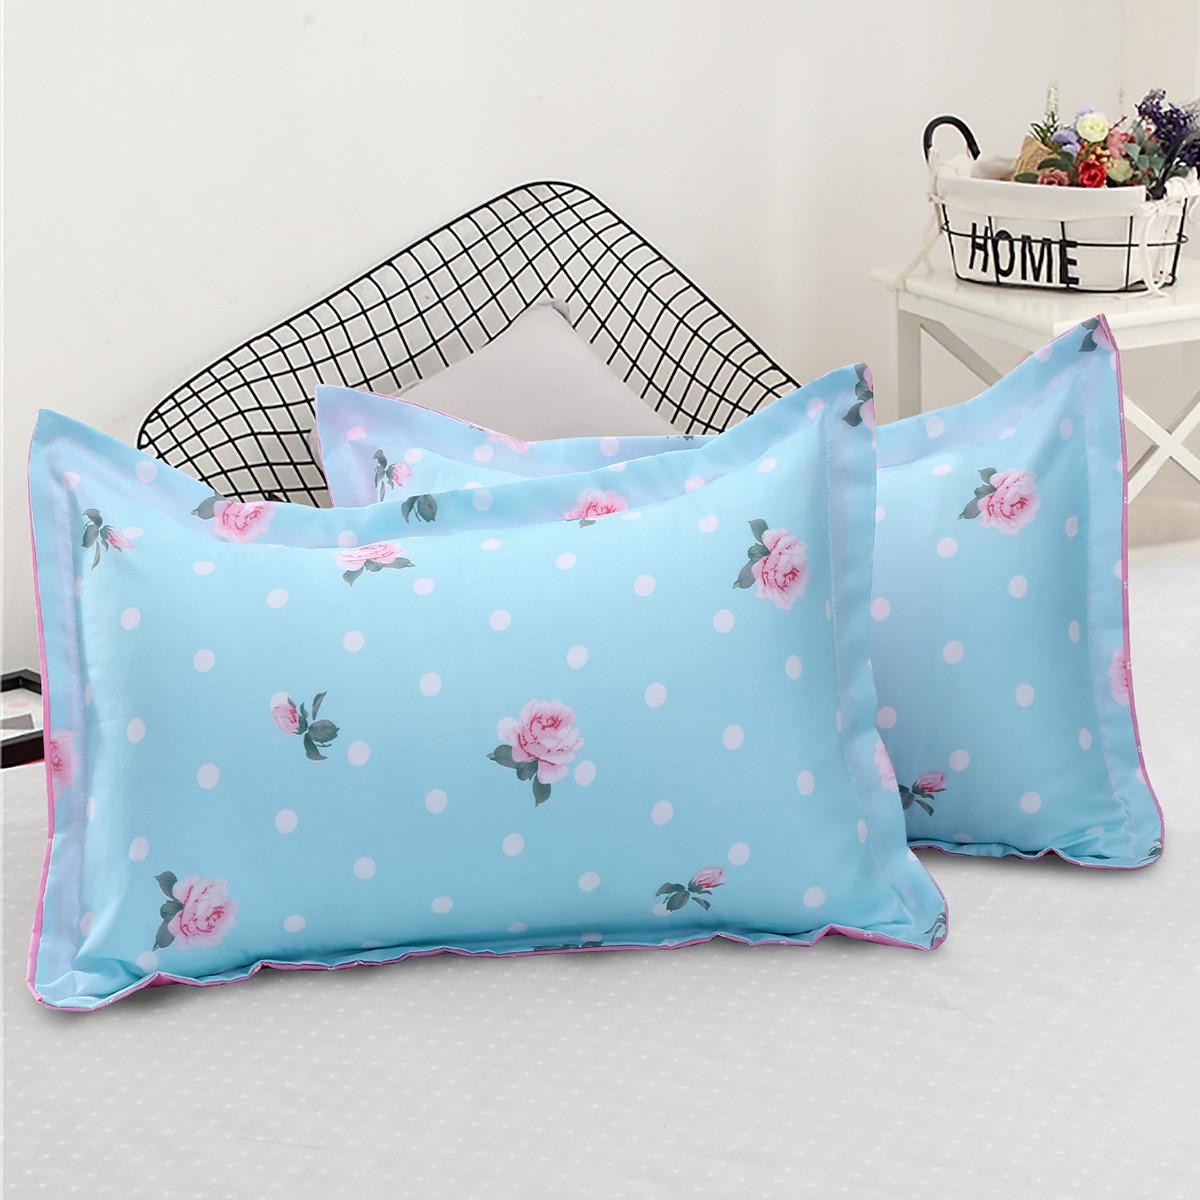 Ramada【年底清仓】柔系列简约枕套床用单品枕头套一对装枕头套枕套COLOR蓝色